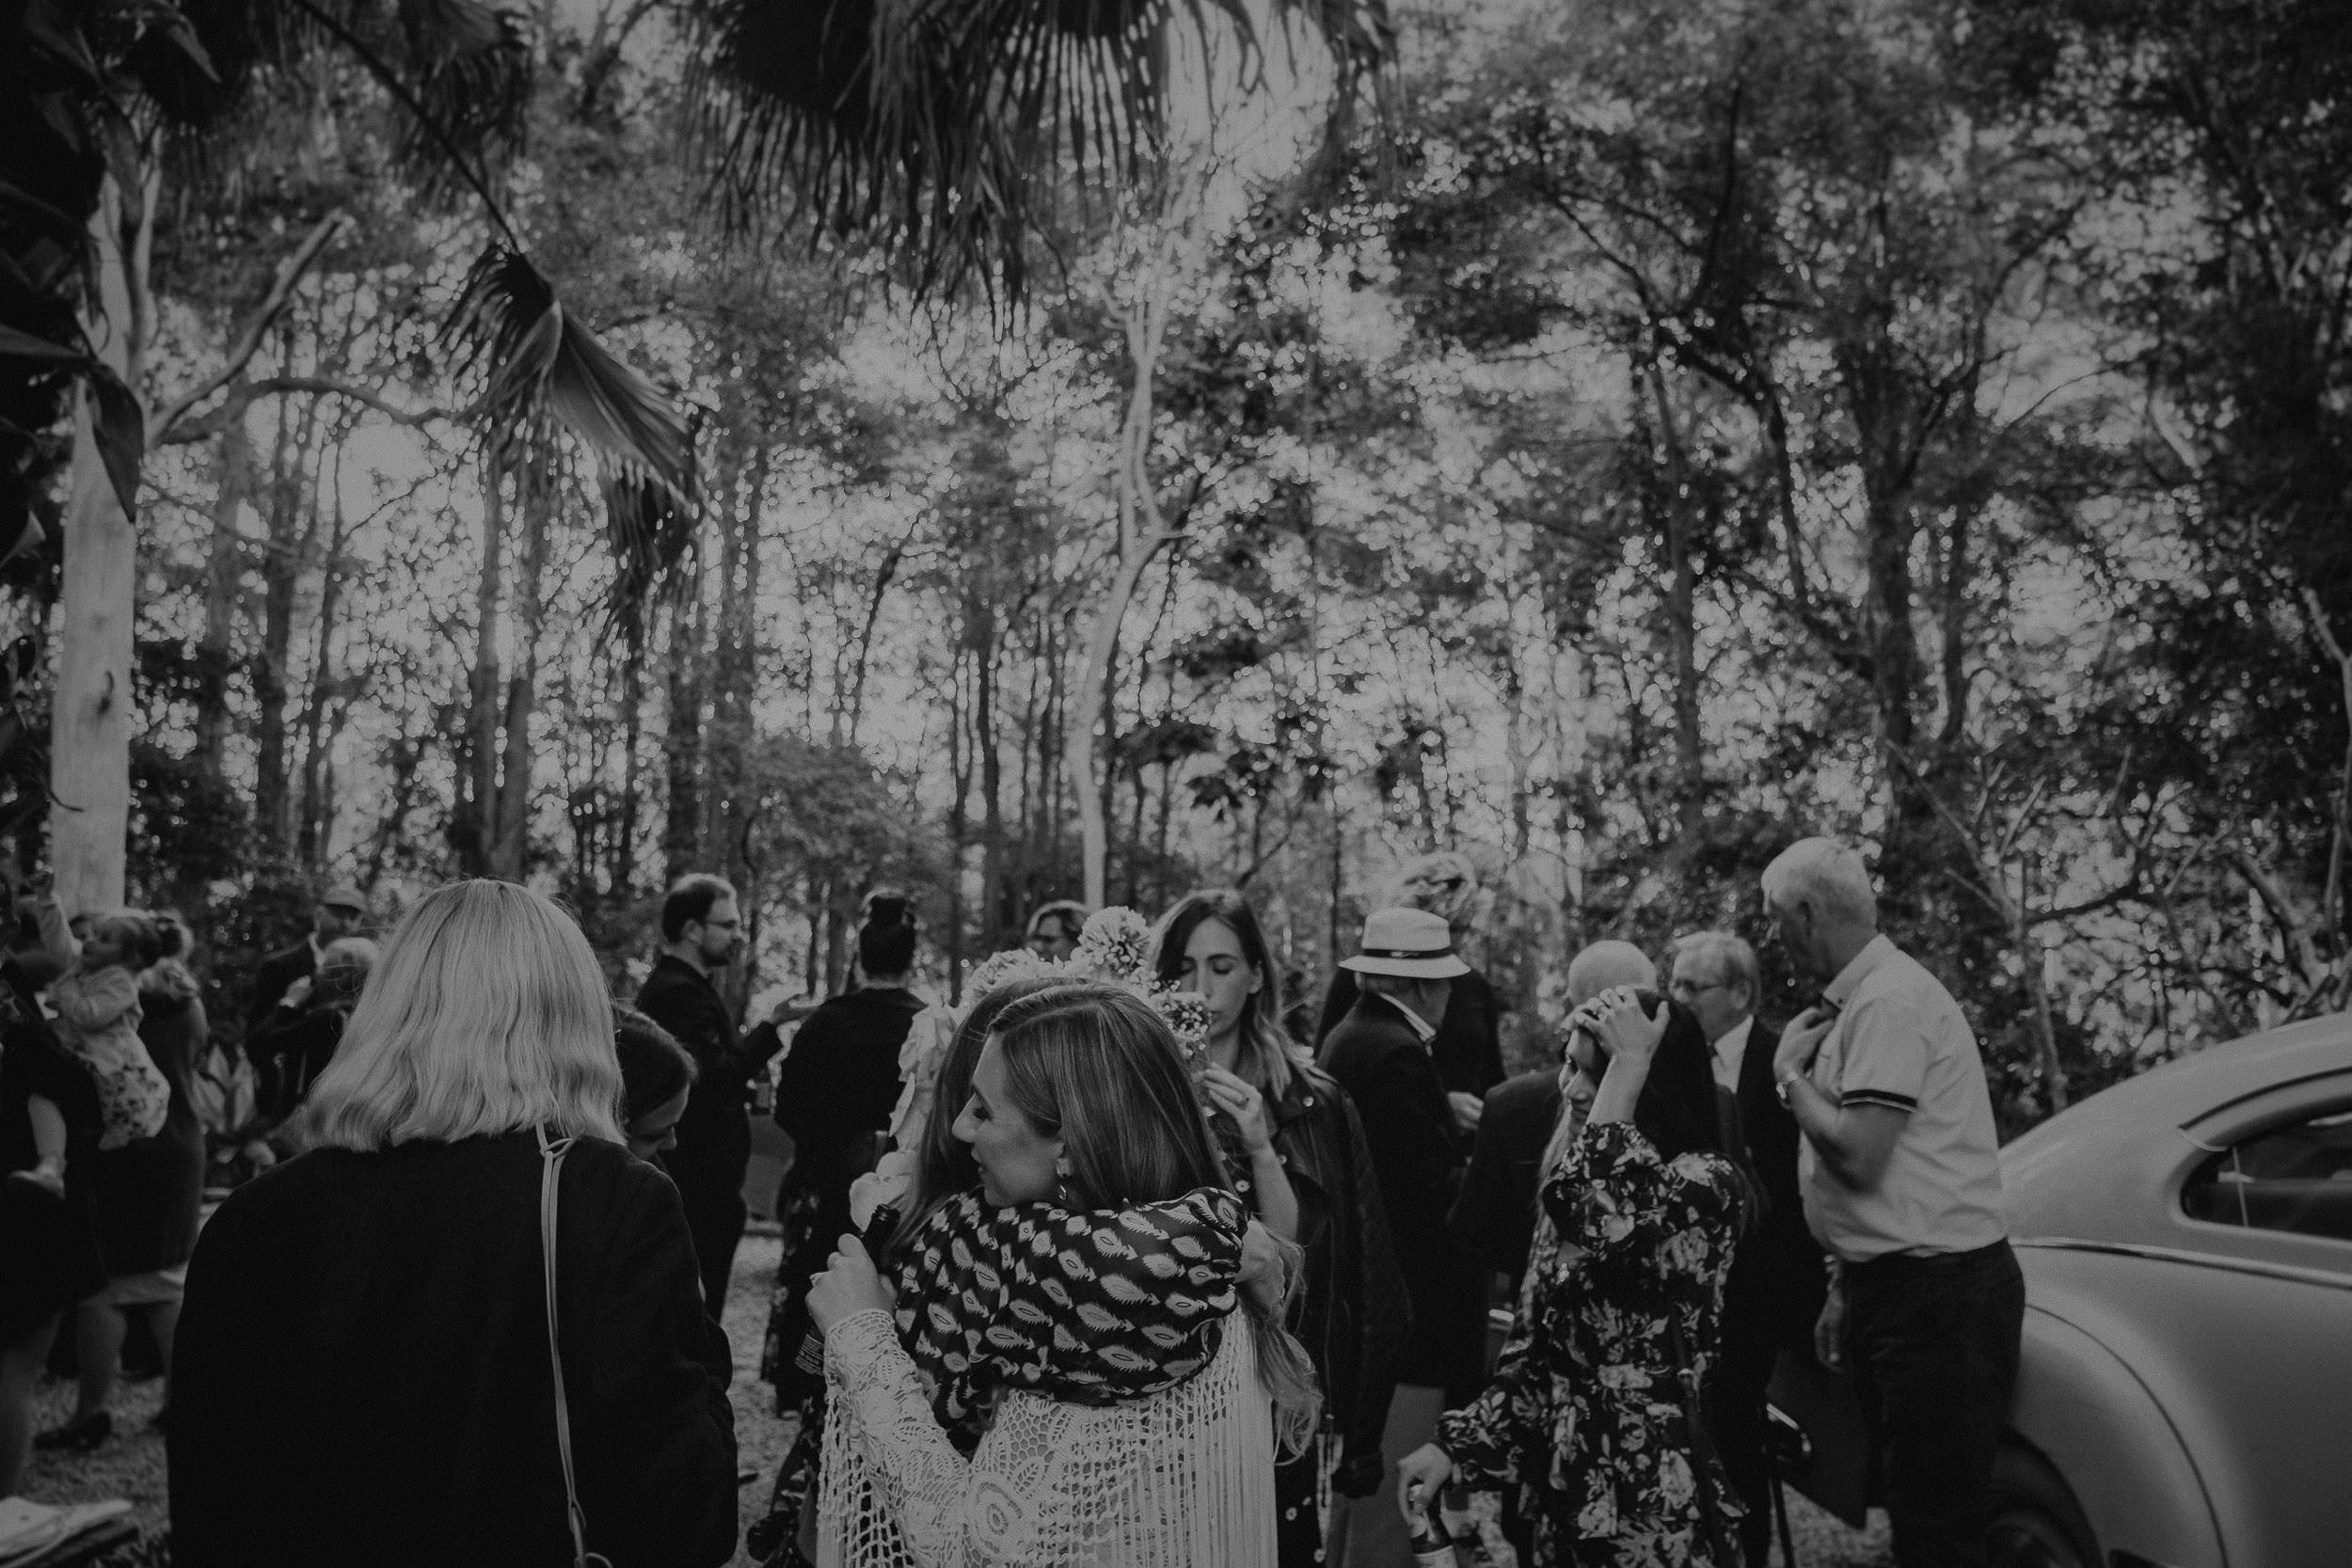 S&A Elopement - Kings & Thieves - Shred 'Til Dead - Central Coast Beach Forest Wedding - 341.jpg